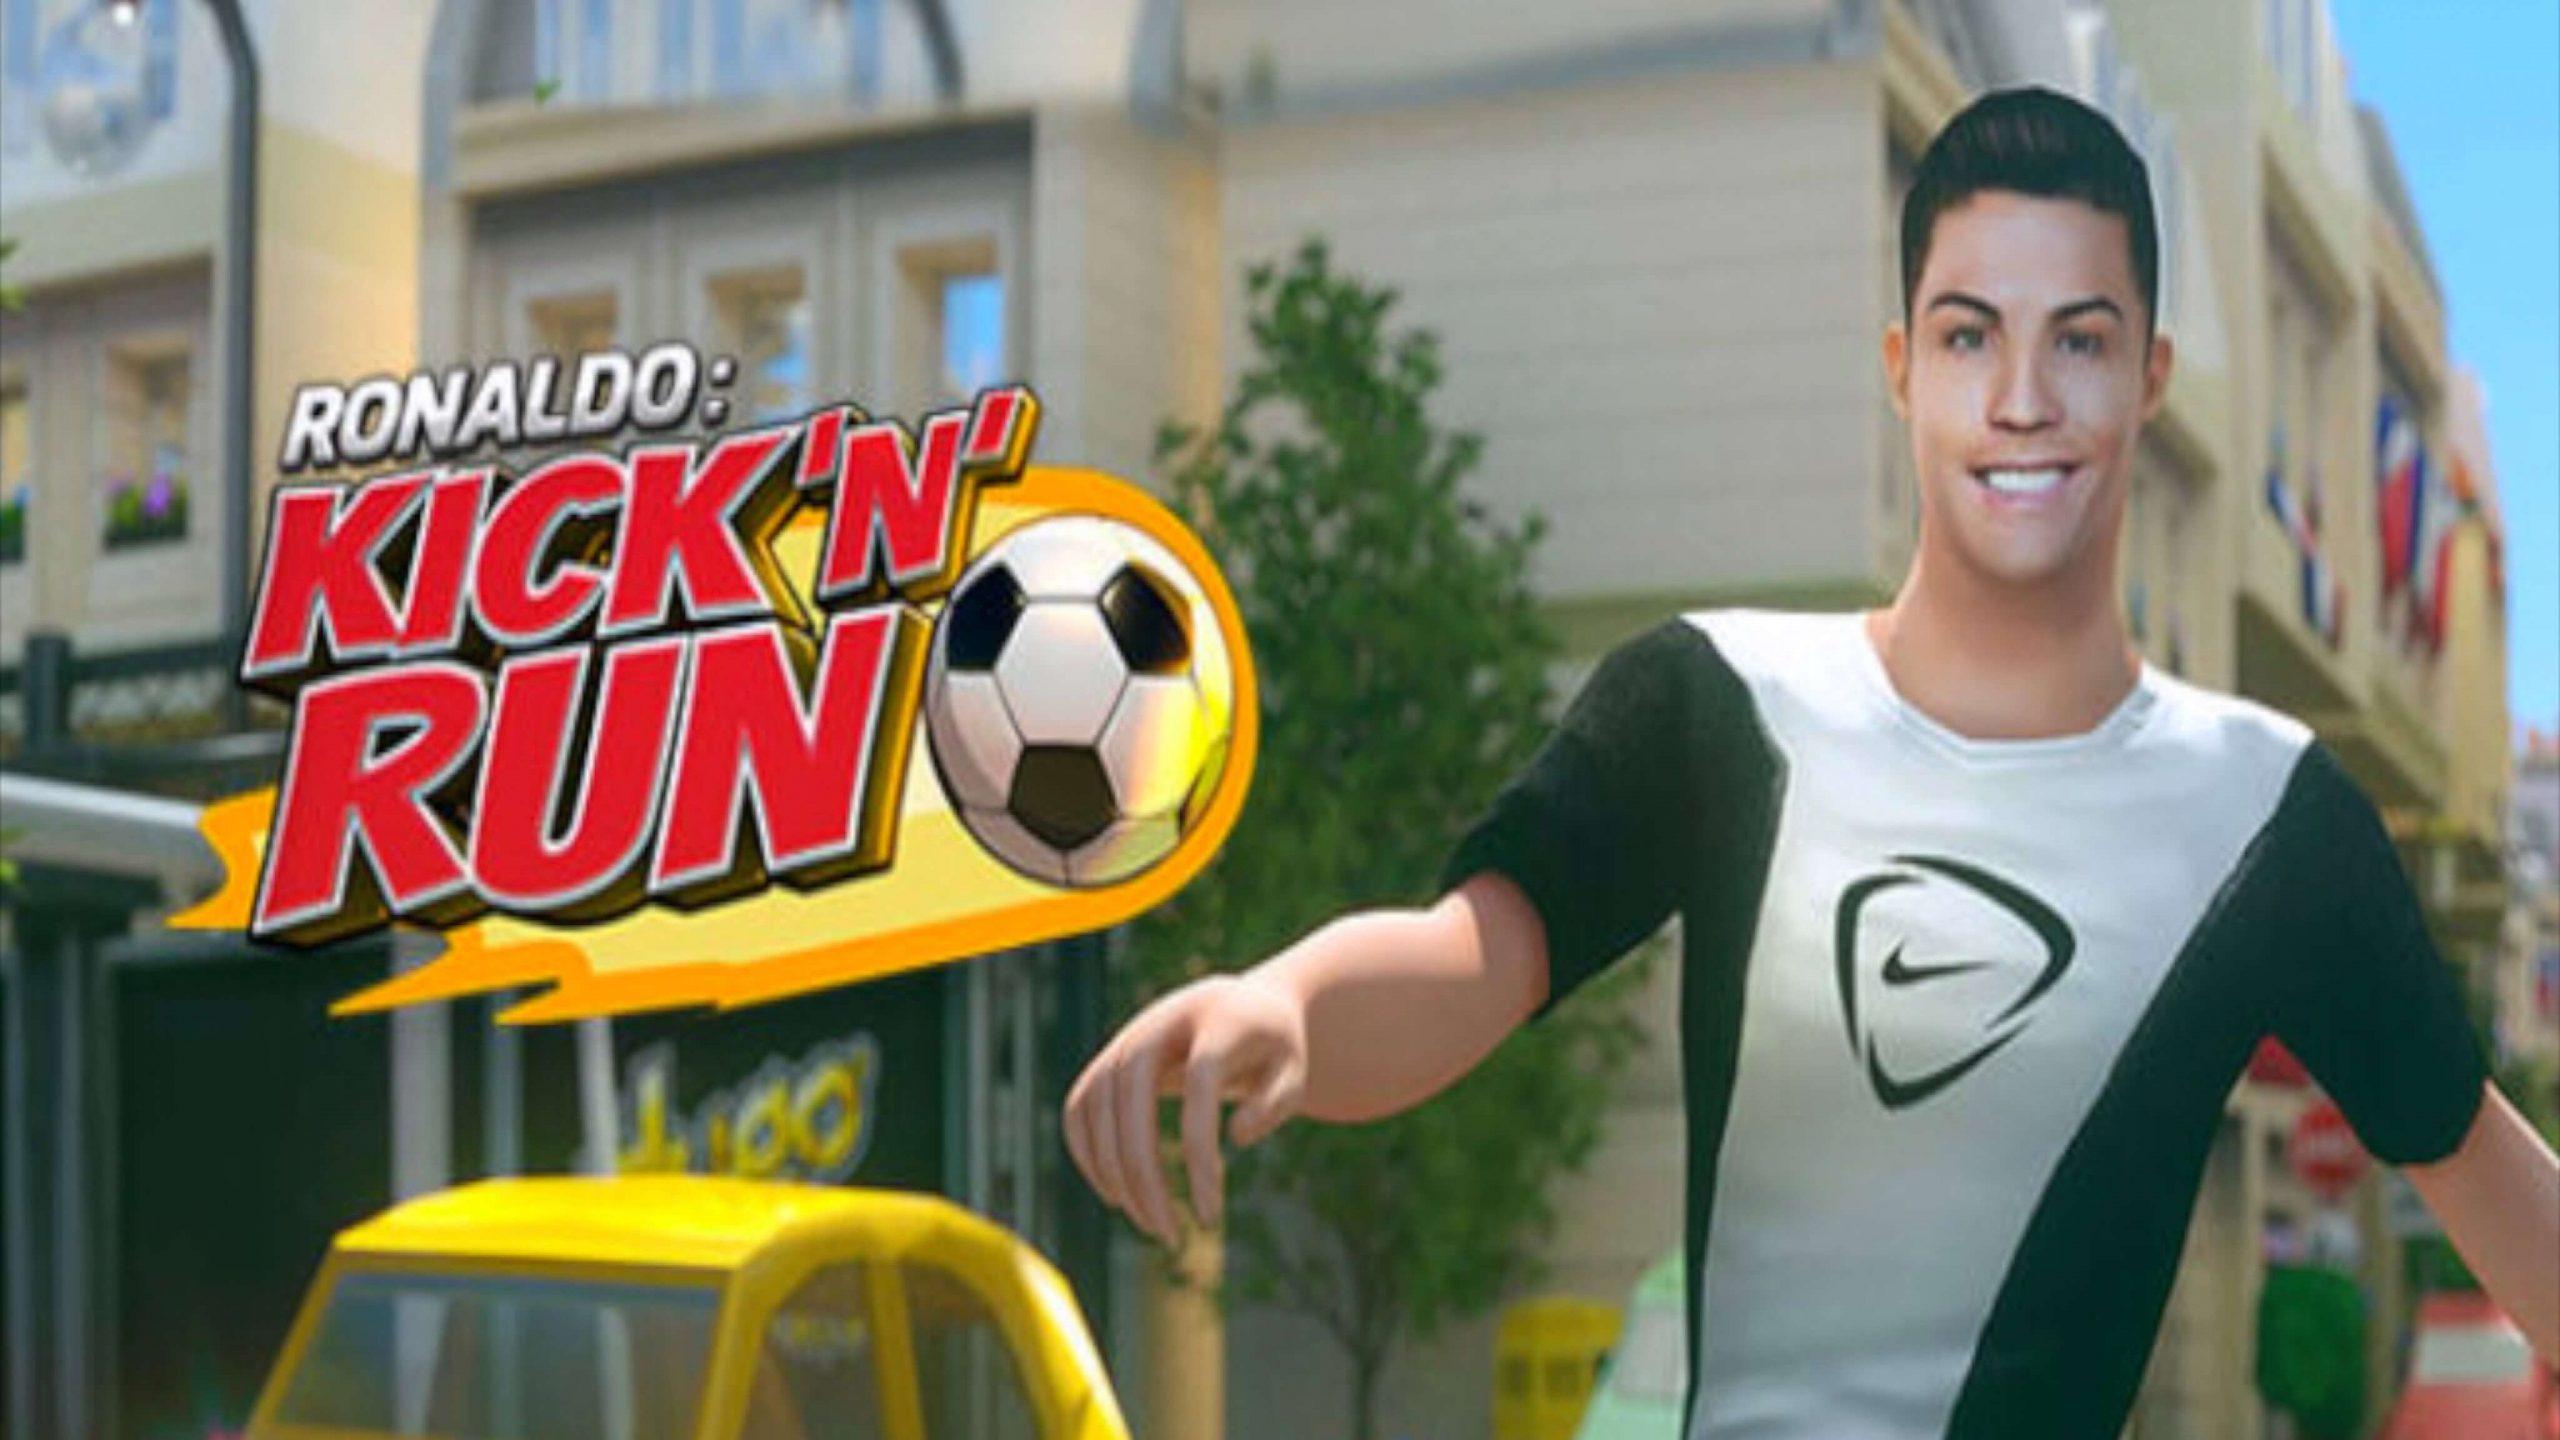 Download Christian Ronald: Kick 'n' run For PC